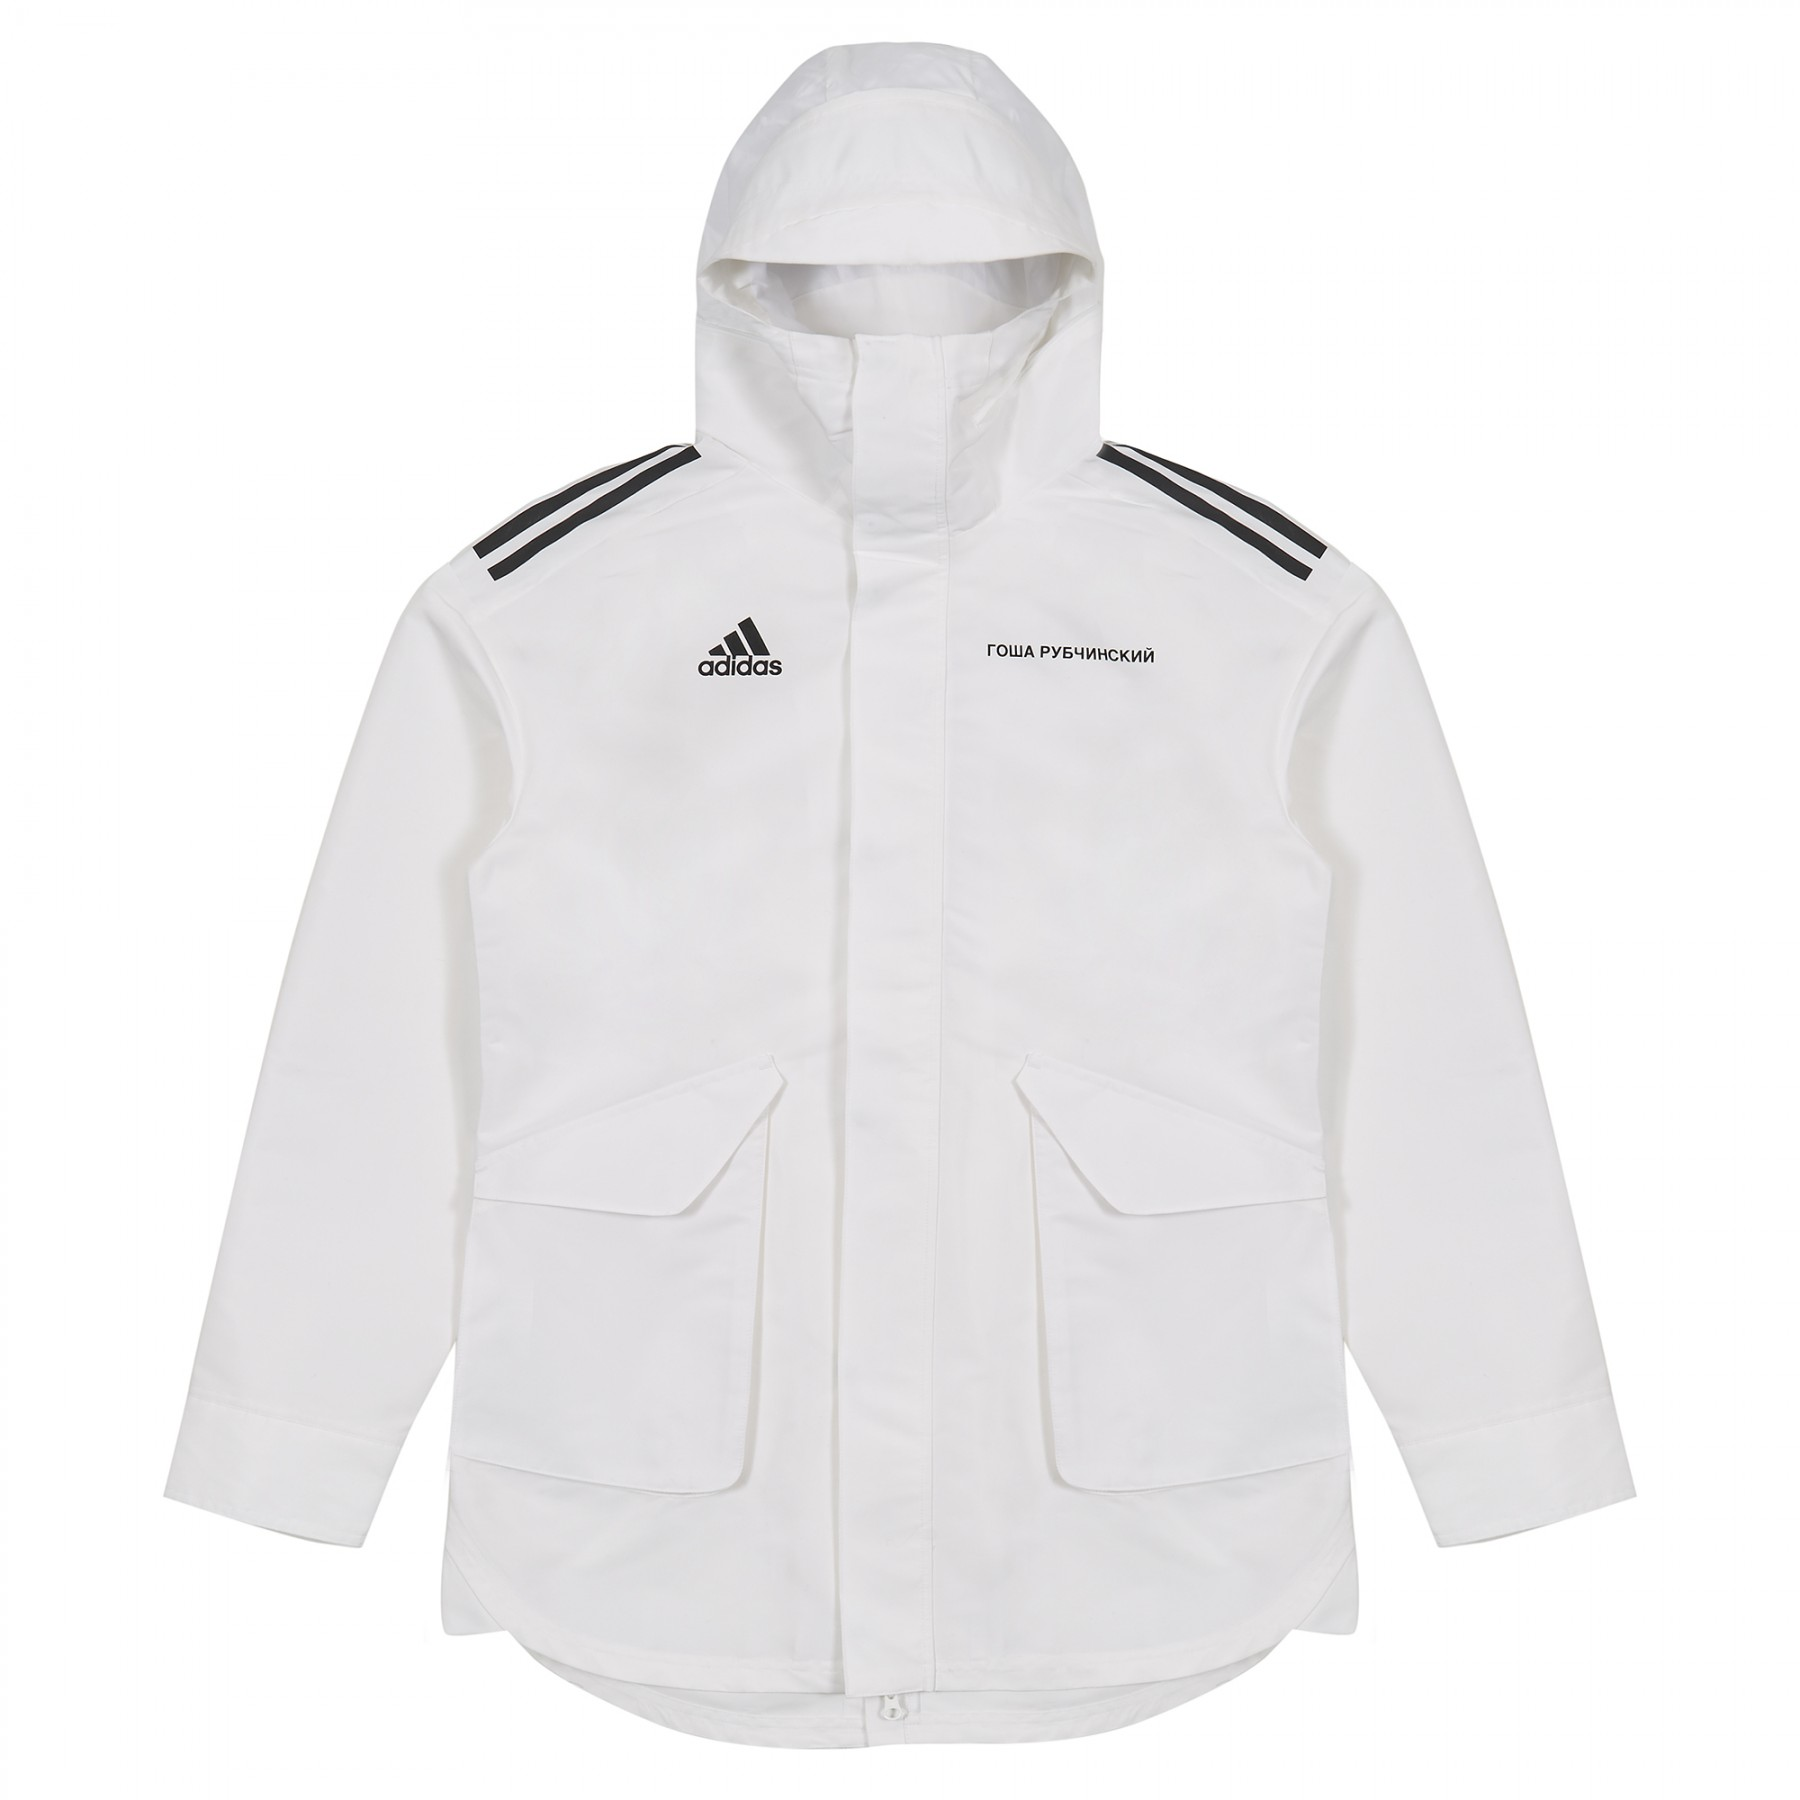 Adidas x Gosha Rubchinskiy weather jacket